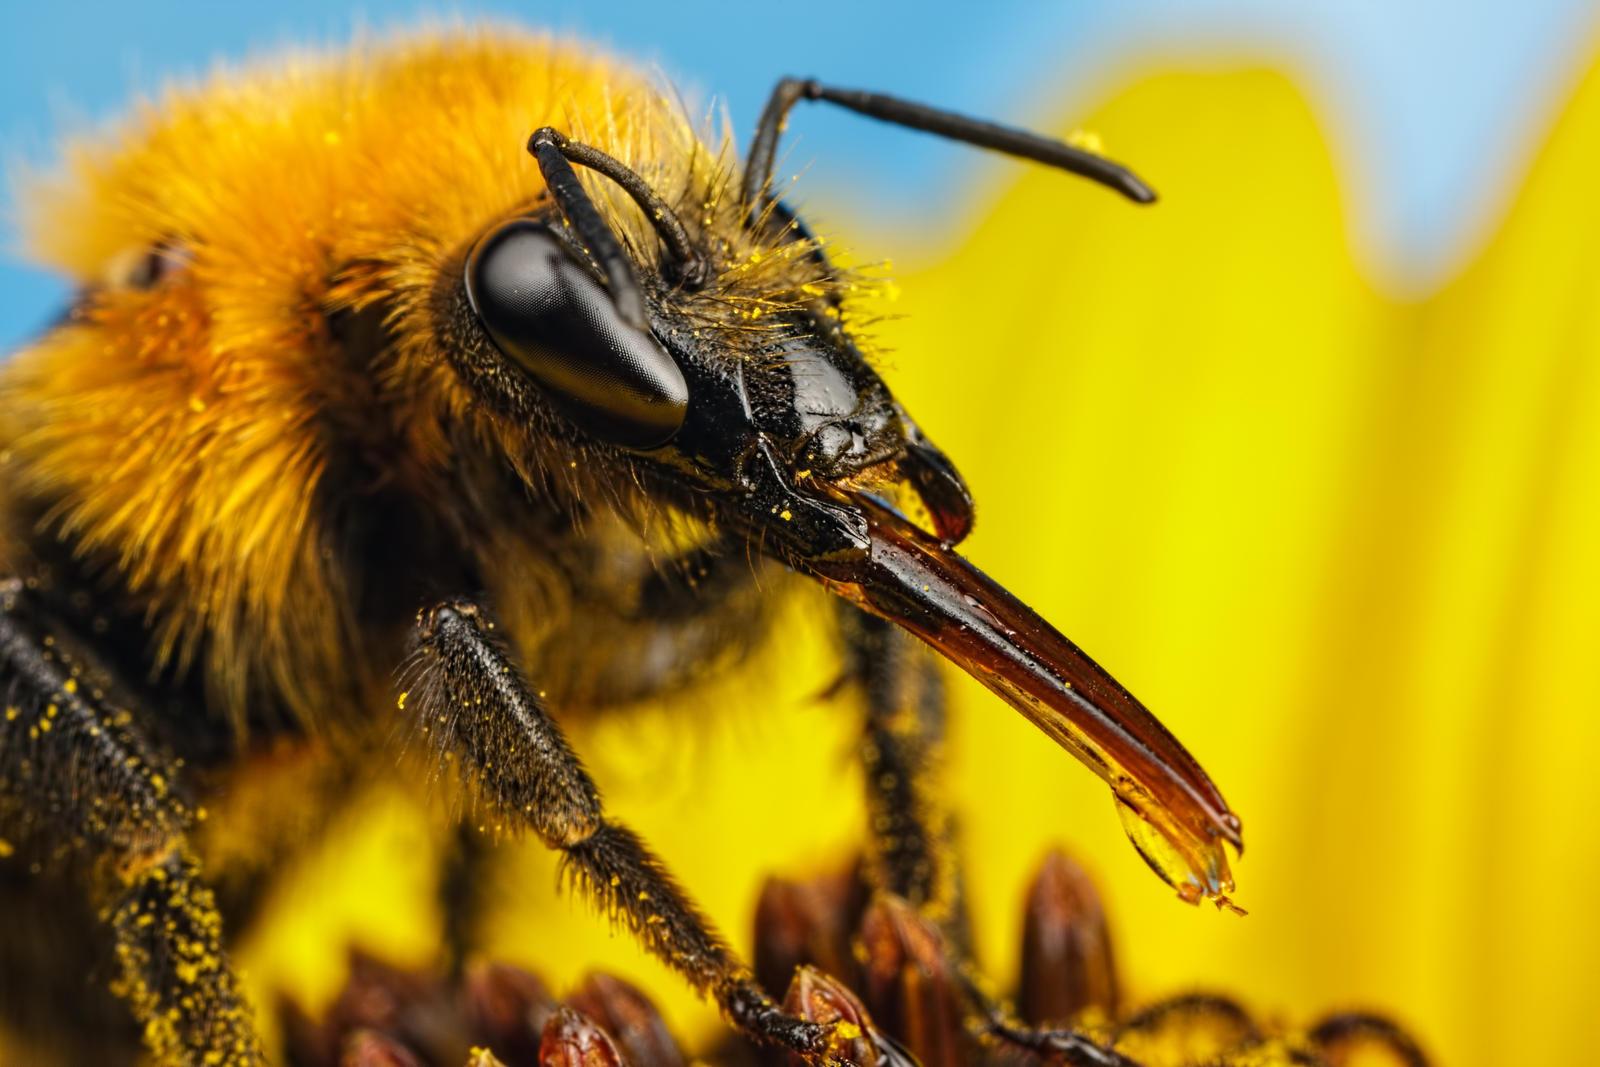 Feeding Bumblebee on a Sunflower by dalantech